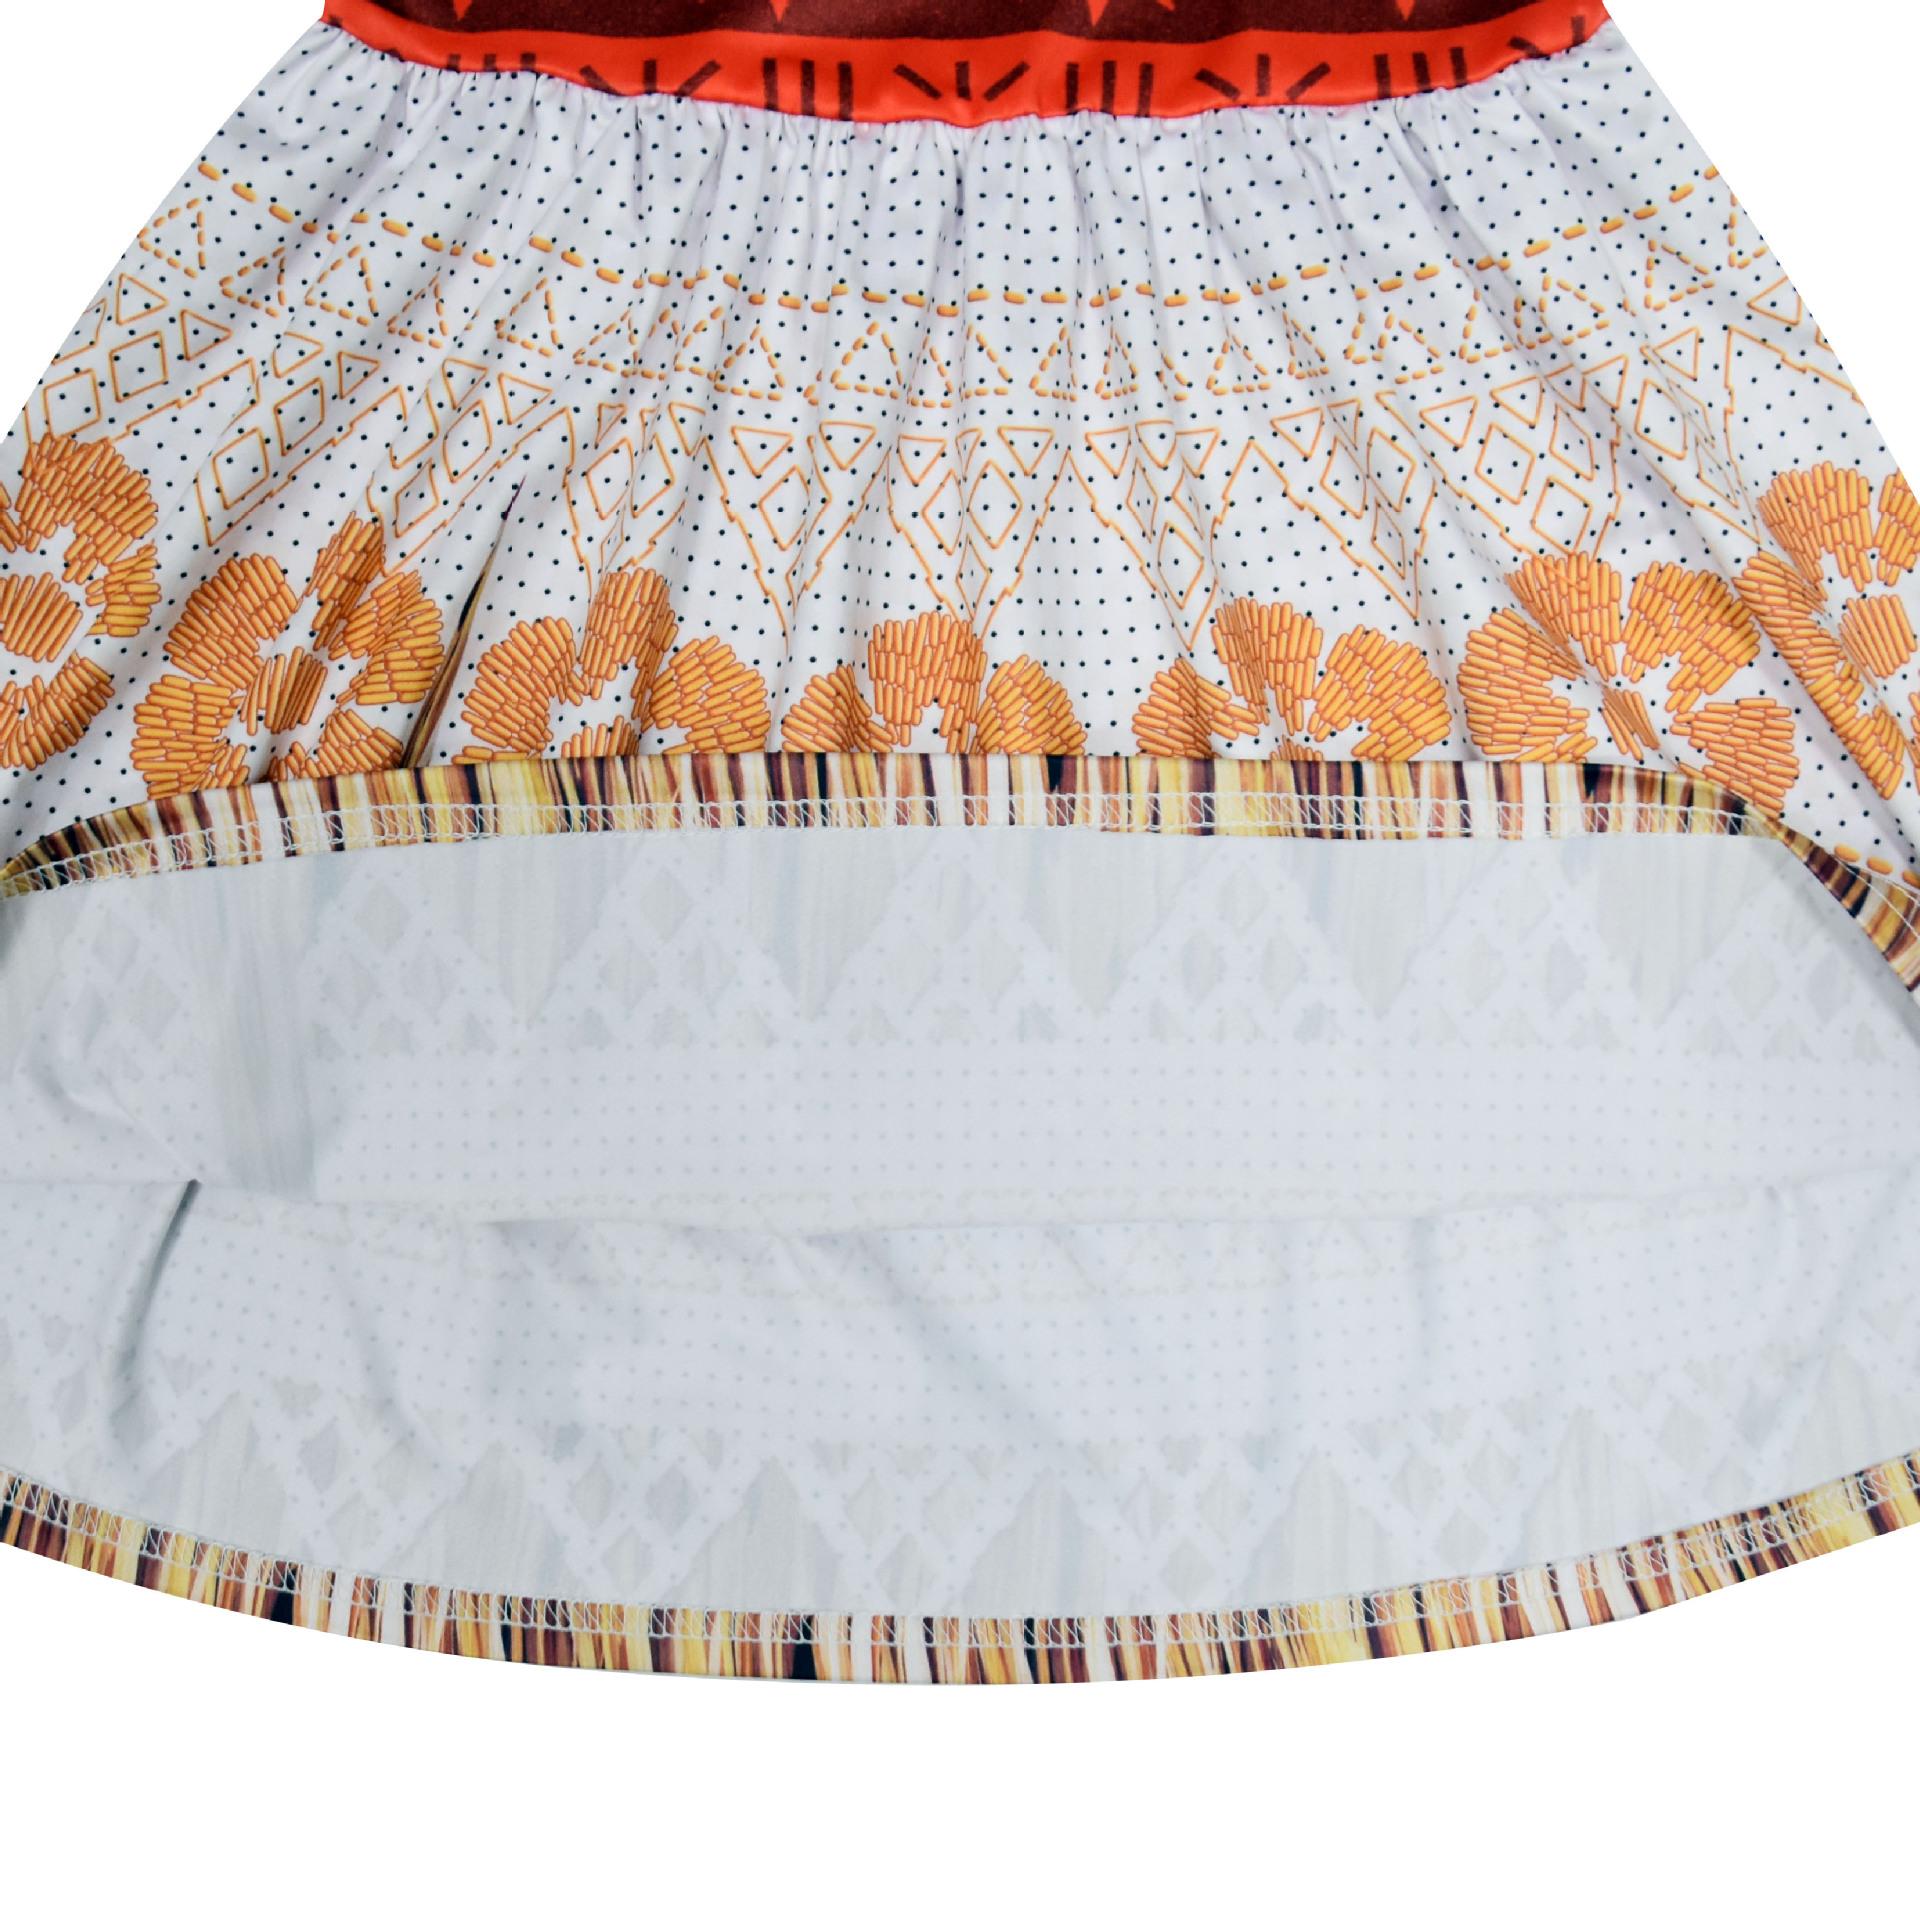 2020 New Moana Dress up Clothes Baby Girls christmas Vaiana Princess Cosplay Costume Toddler Kids Summer Beach Tutu Sundress